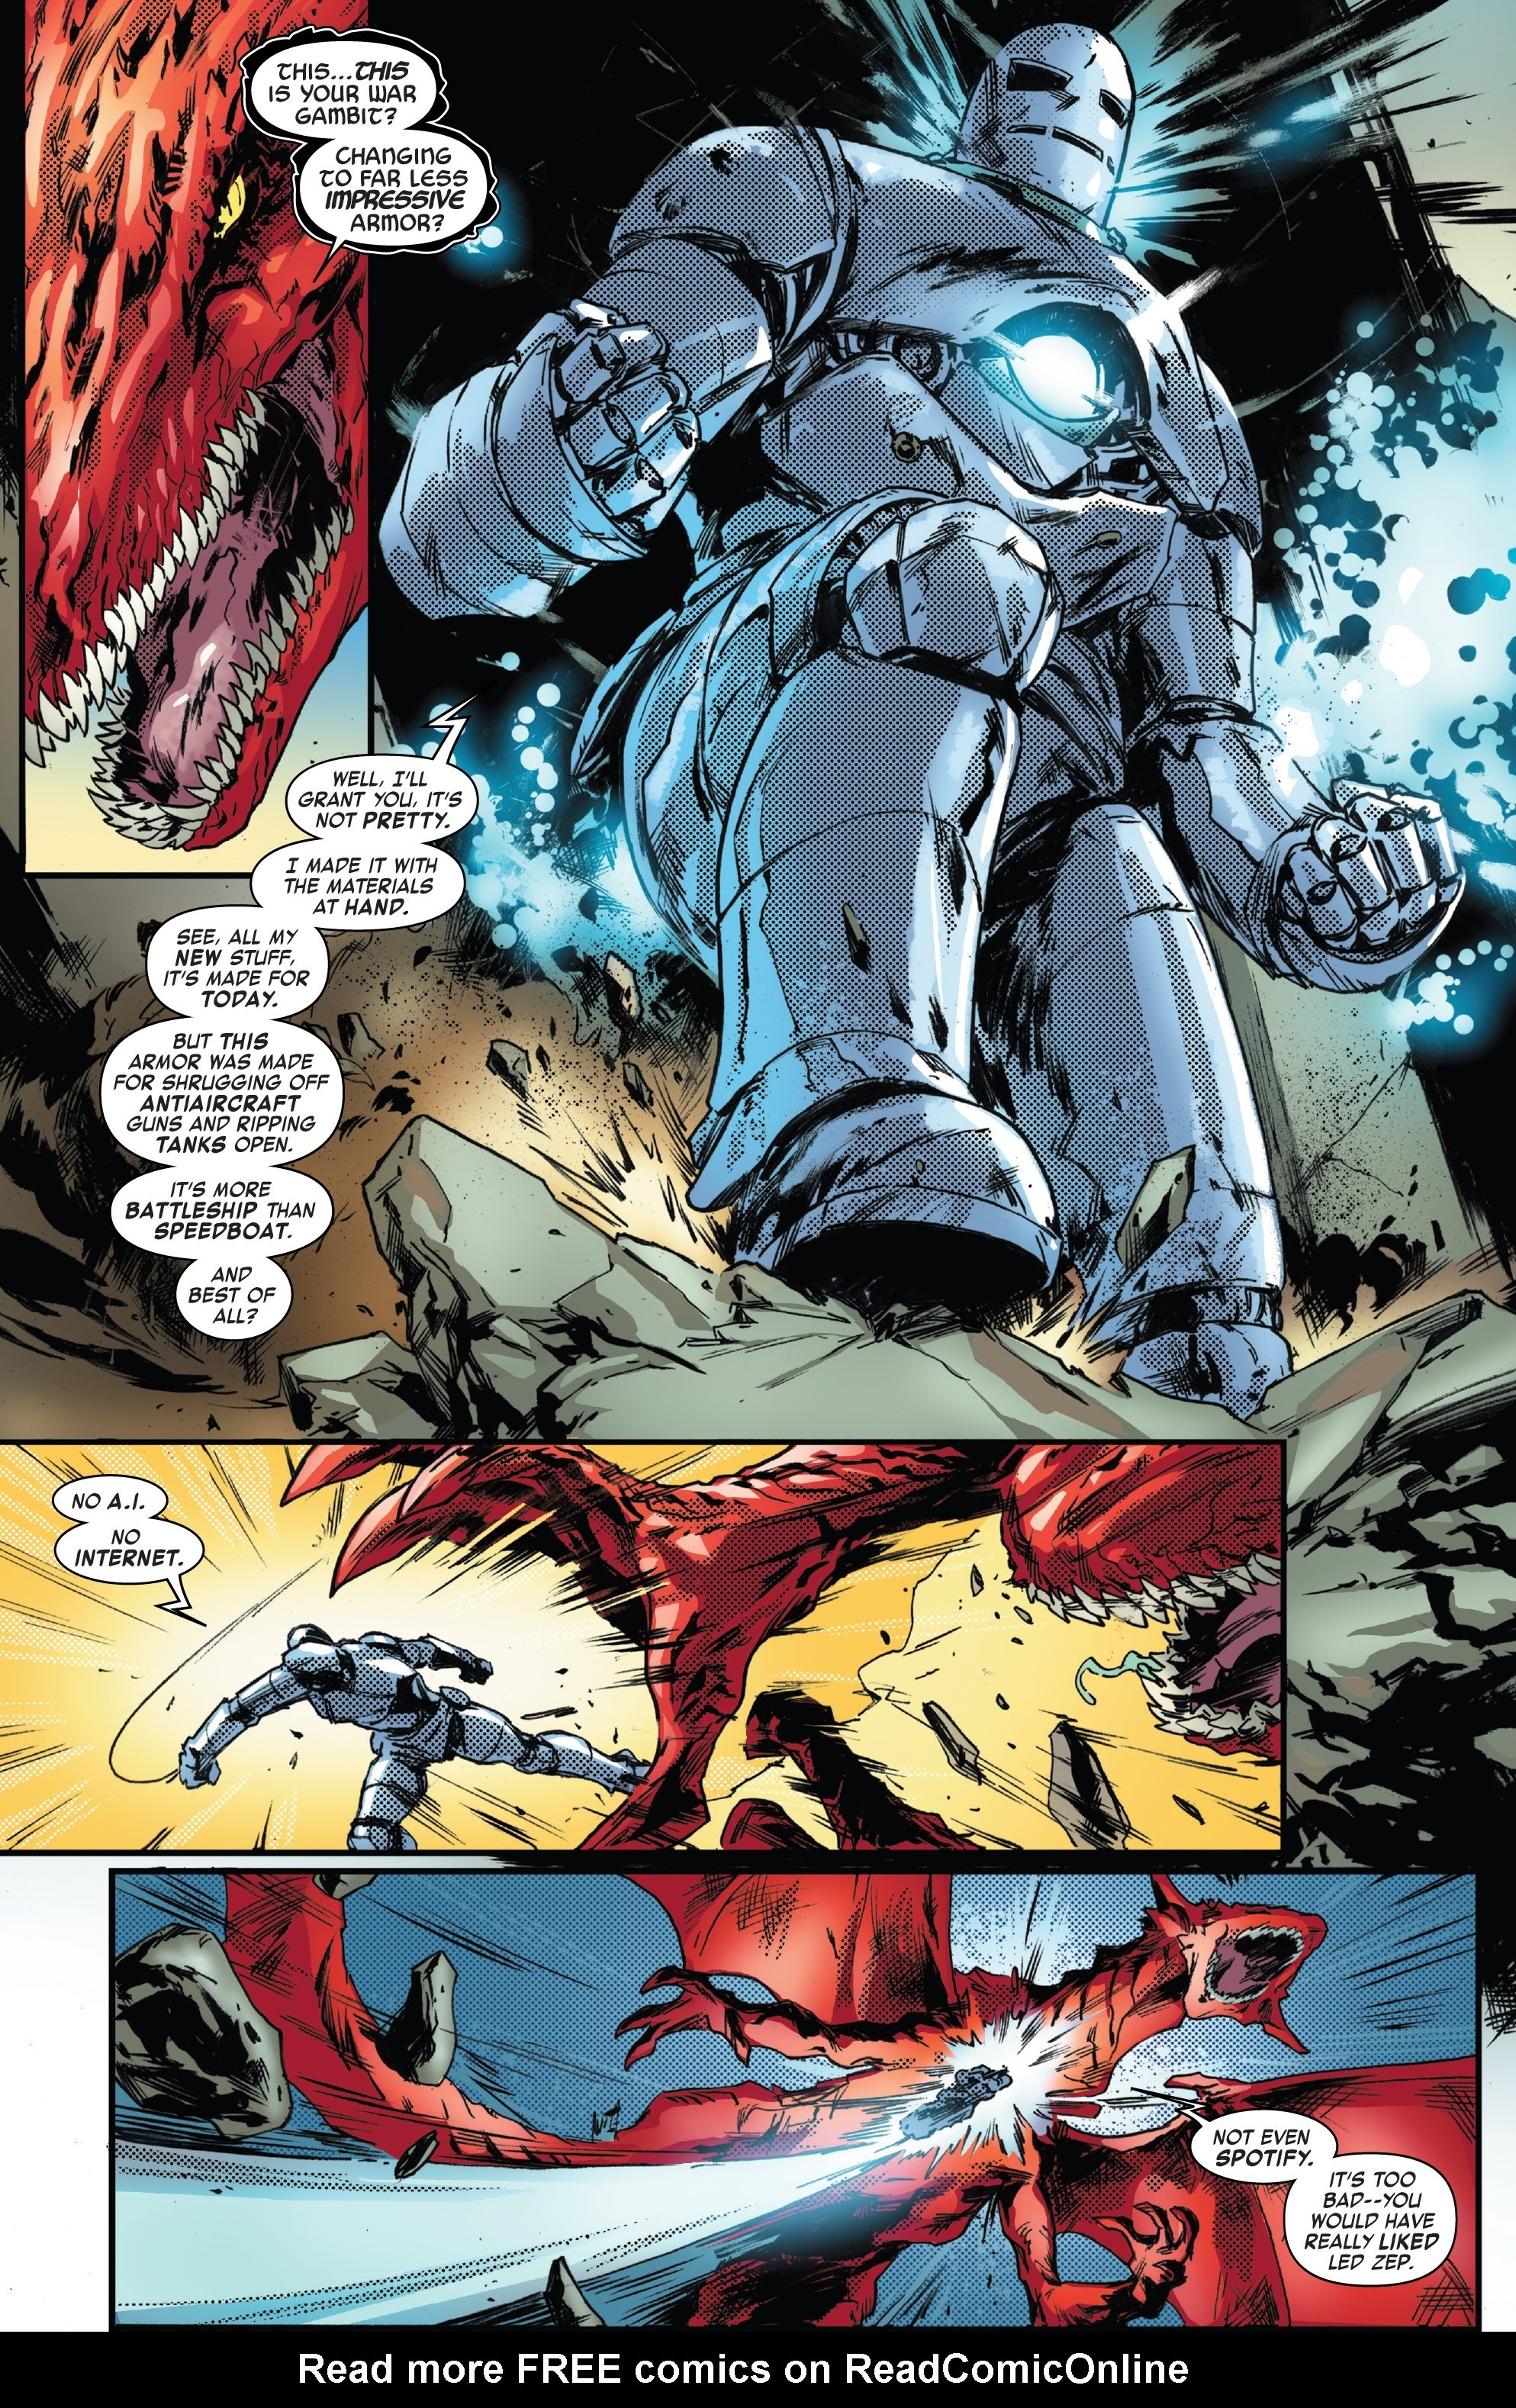 Read online Tony Stark: Iron Man comic -  Issue #13 - 21